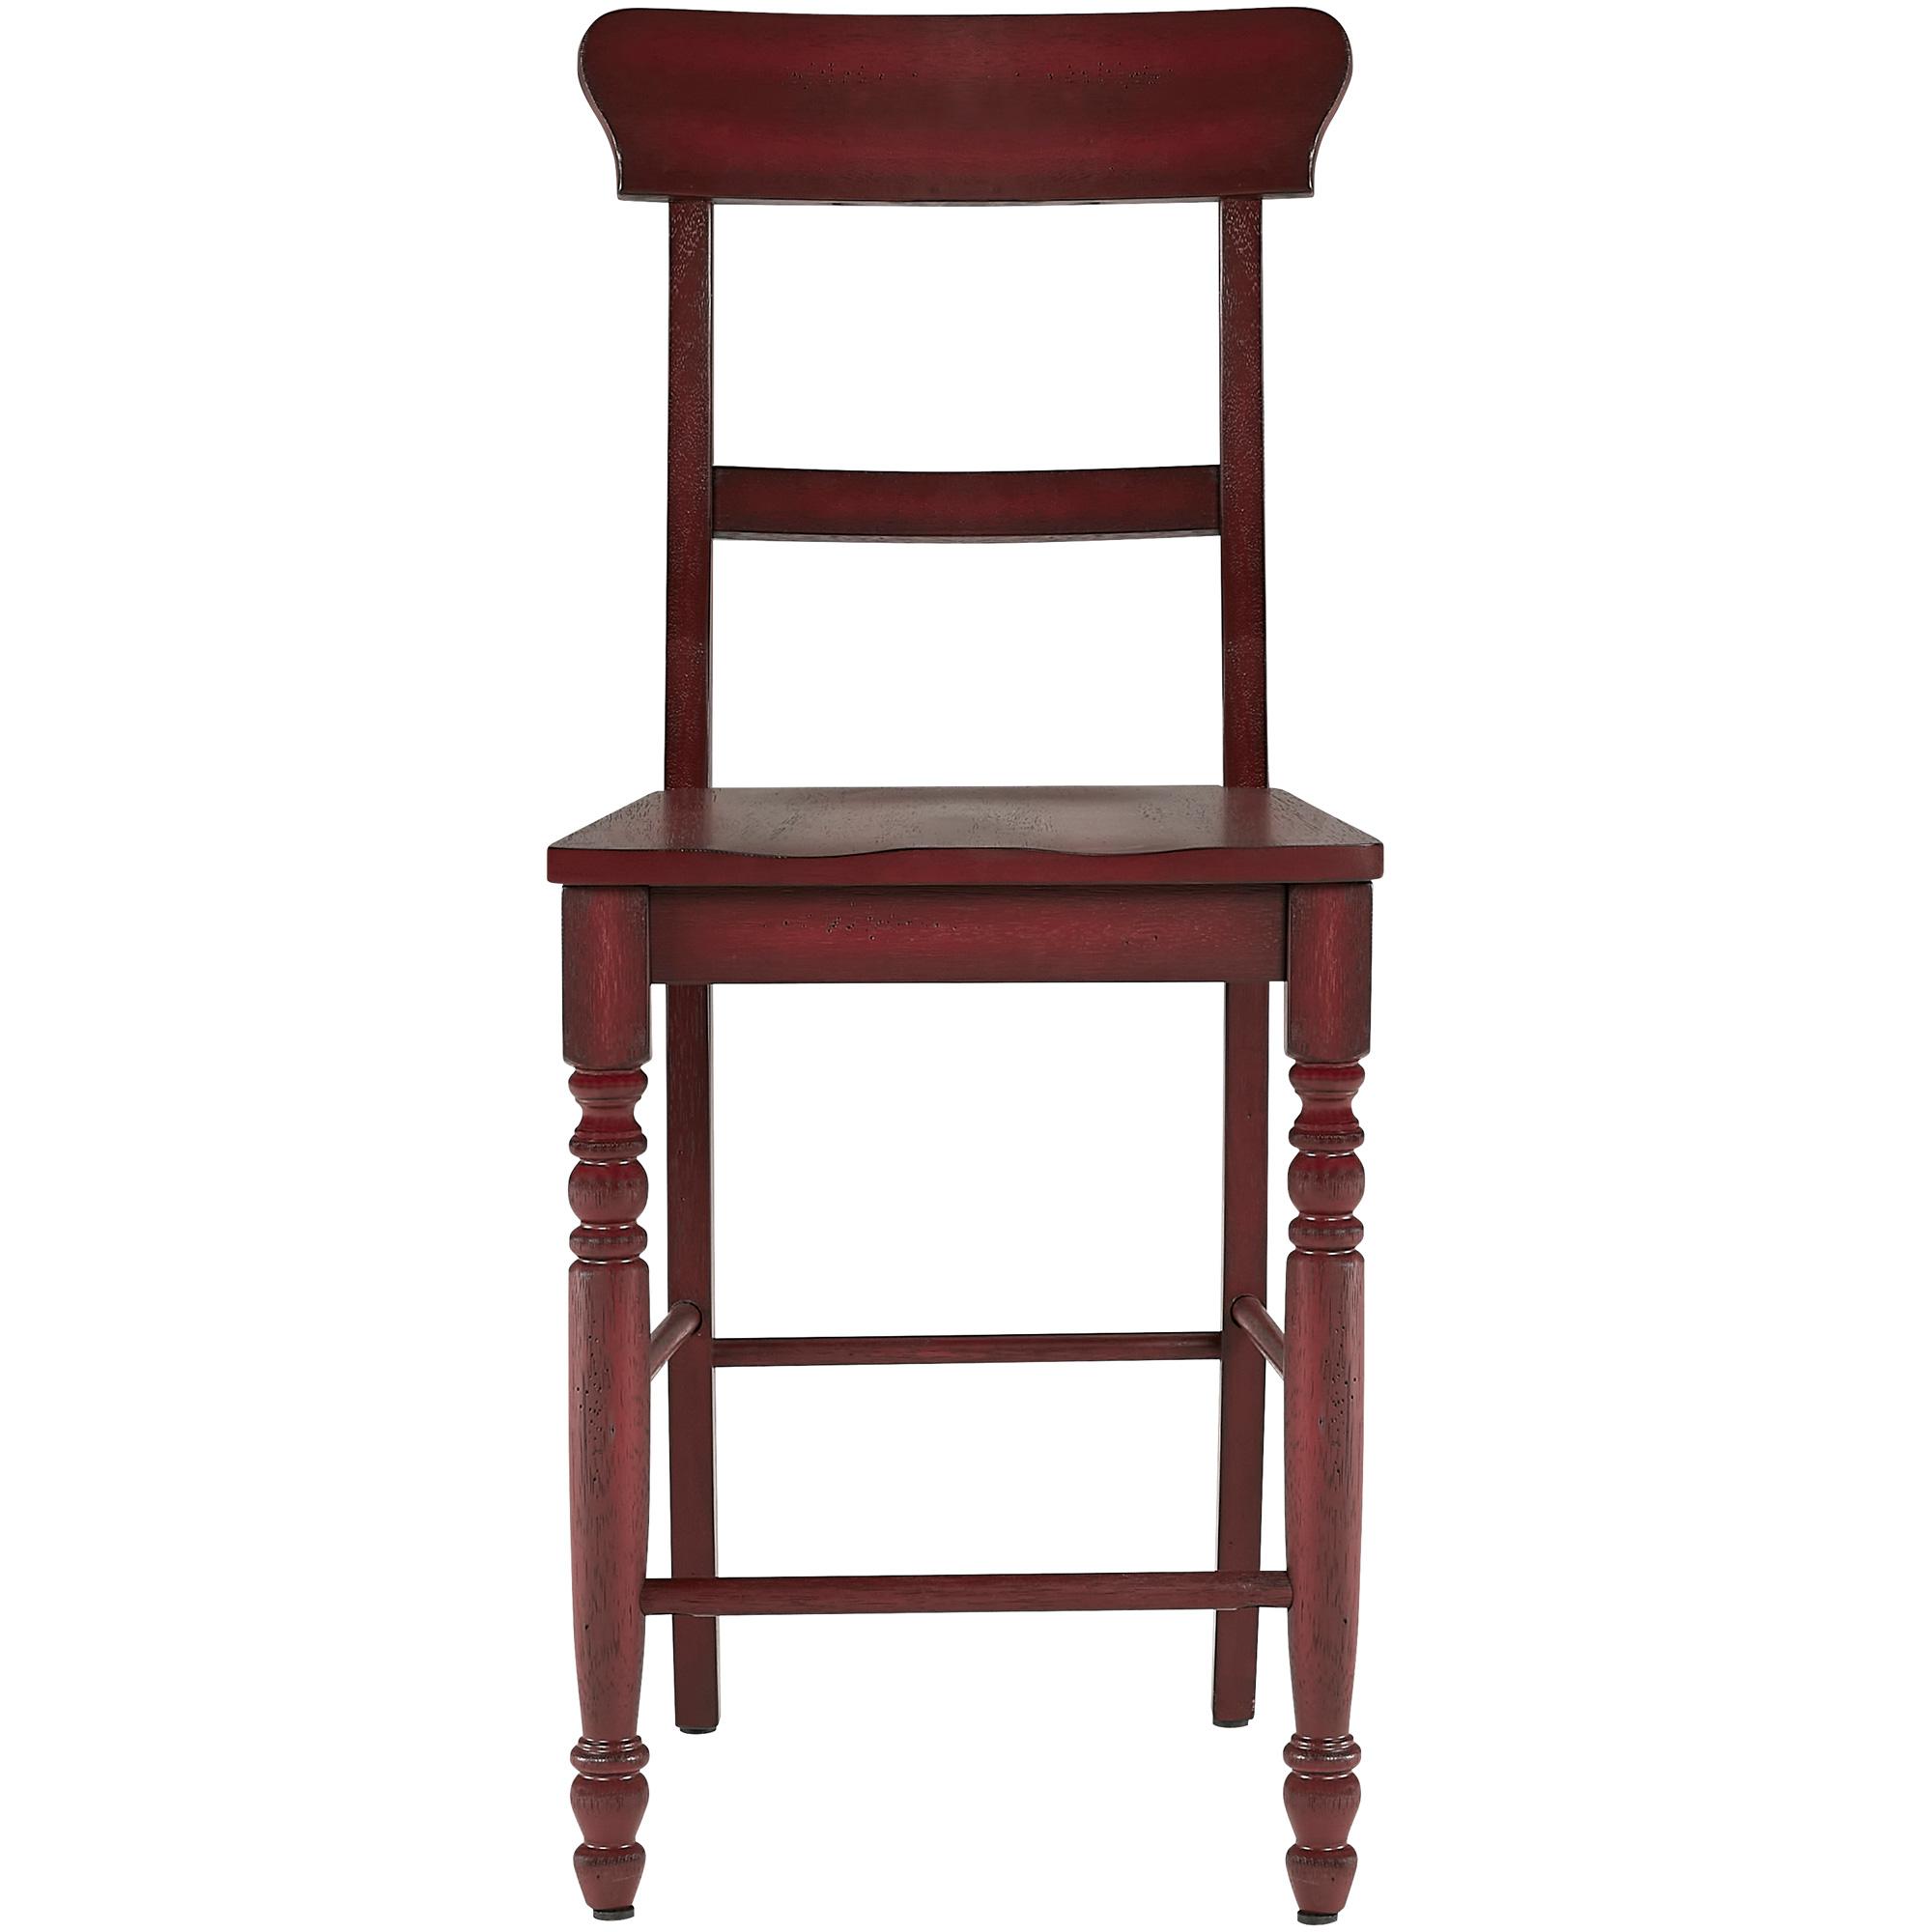 Progressive Furniture Inc. | Savannah Court Antique Red Counter Stool